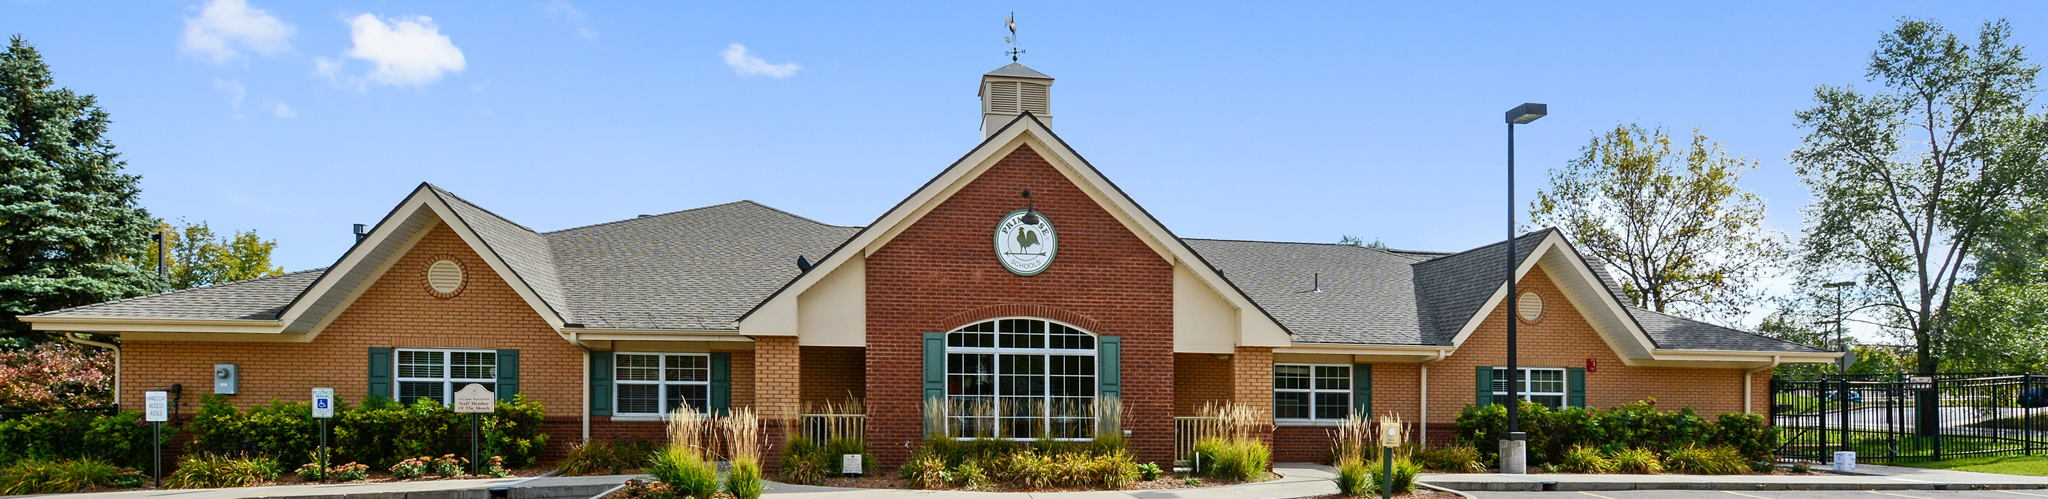 Exterior of a Primrose School of Eden Prairie